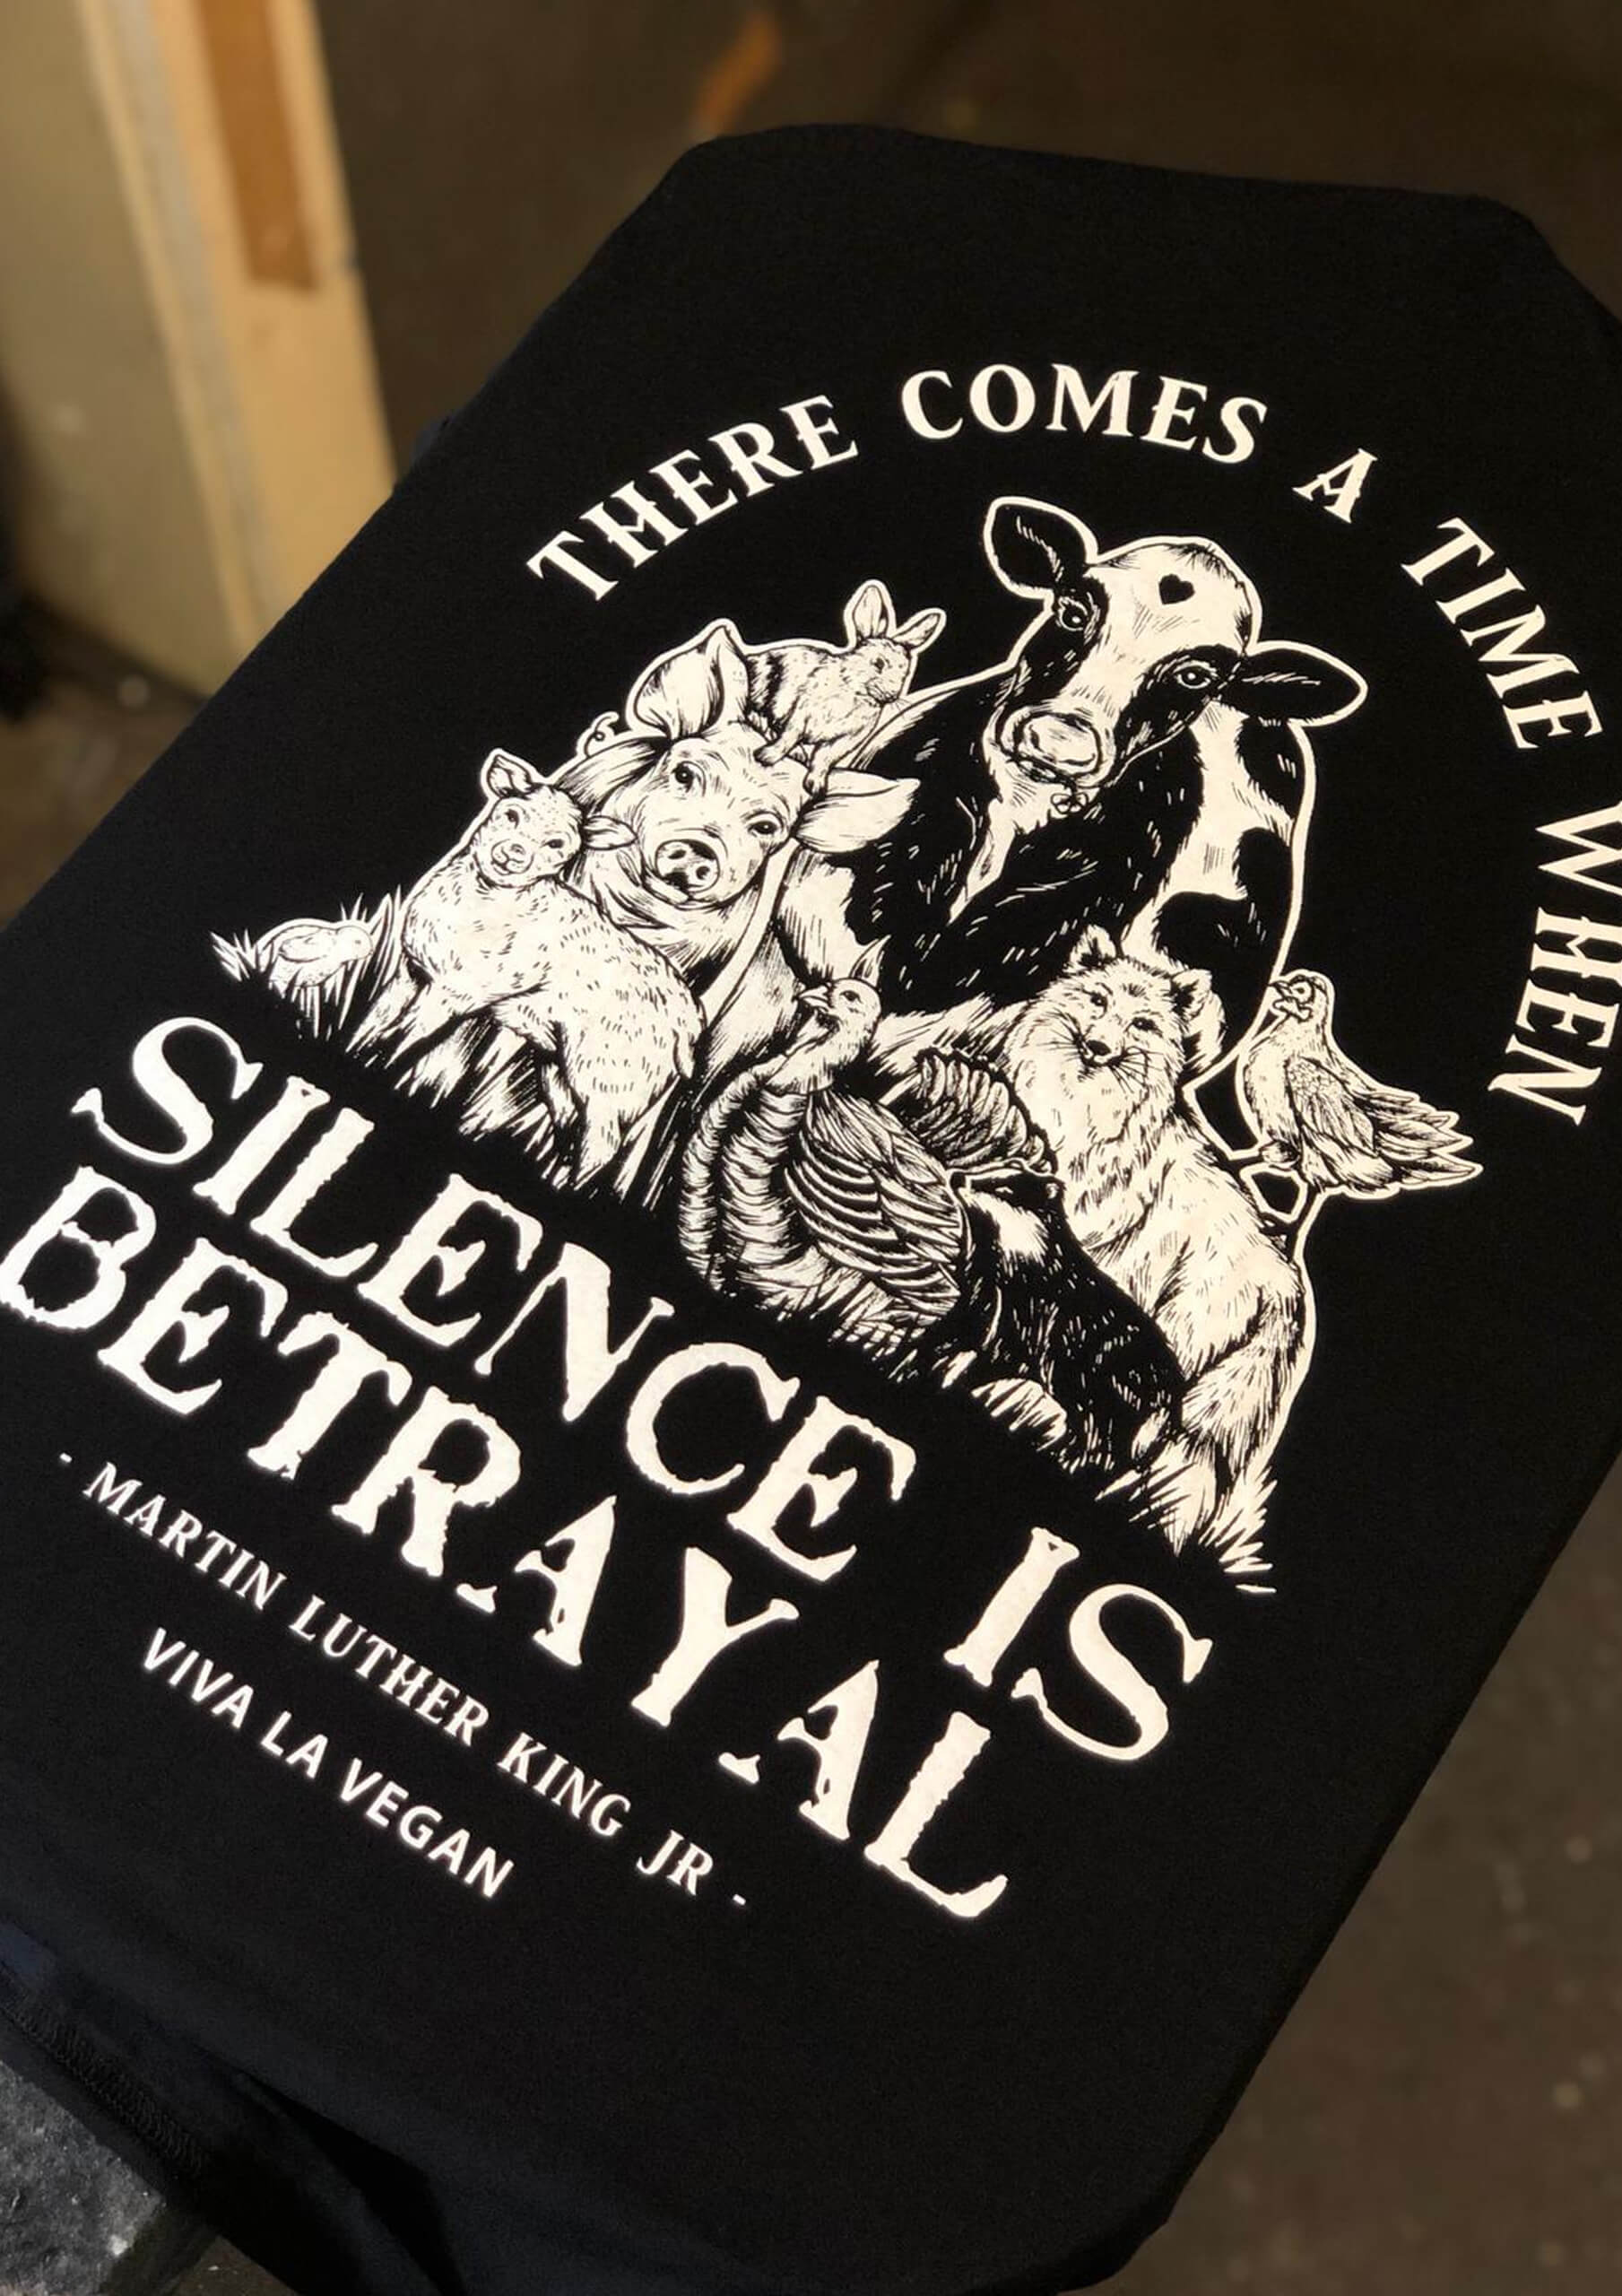 Silence equals violence print detail